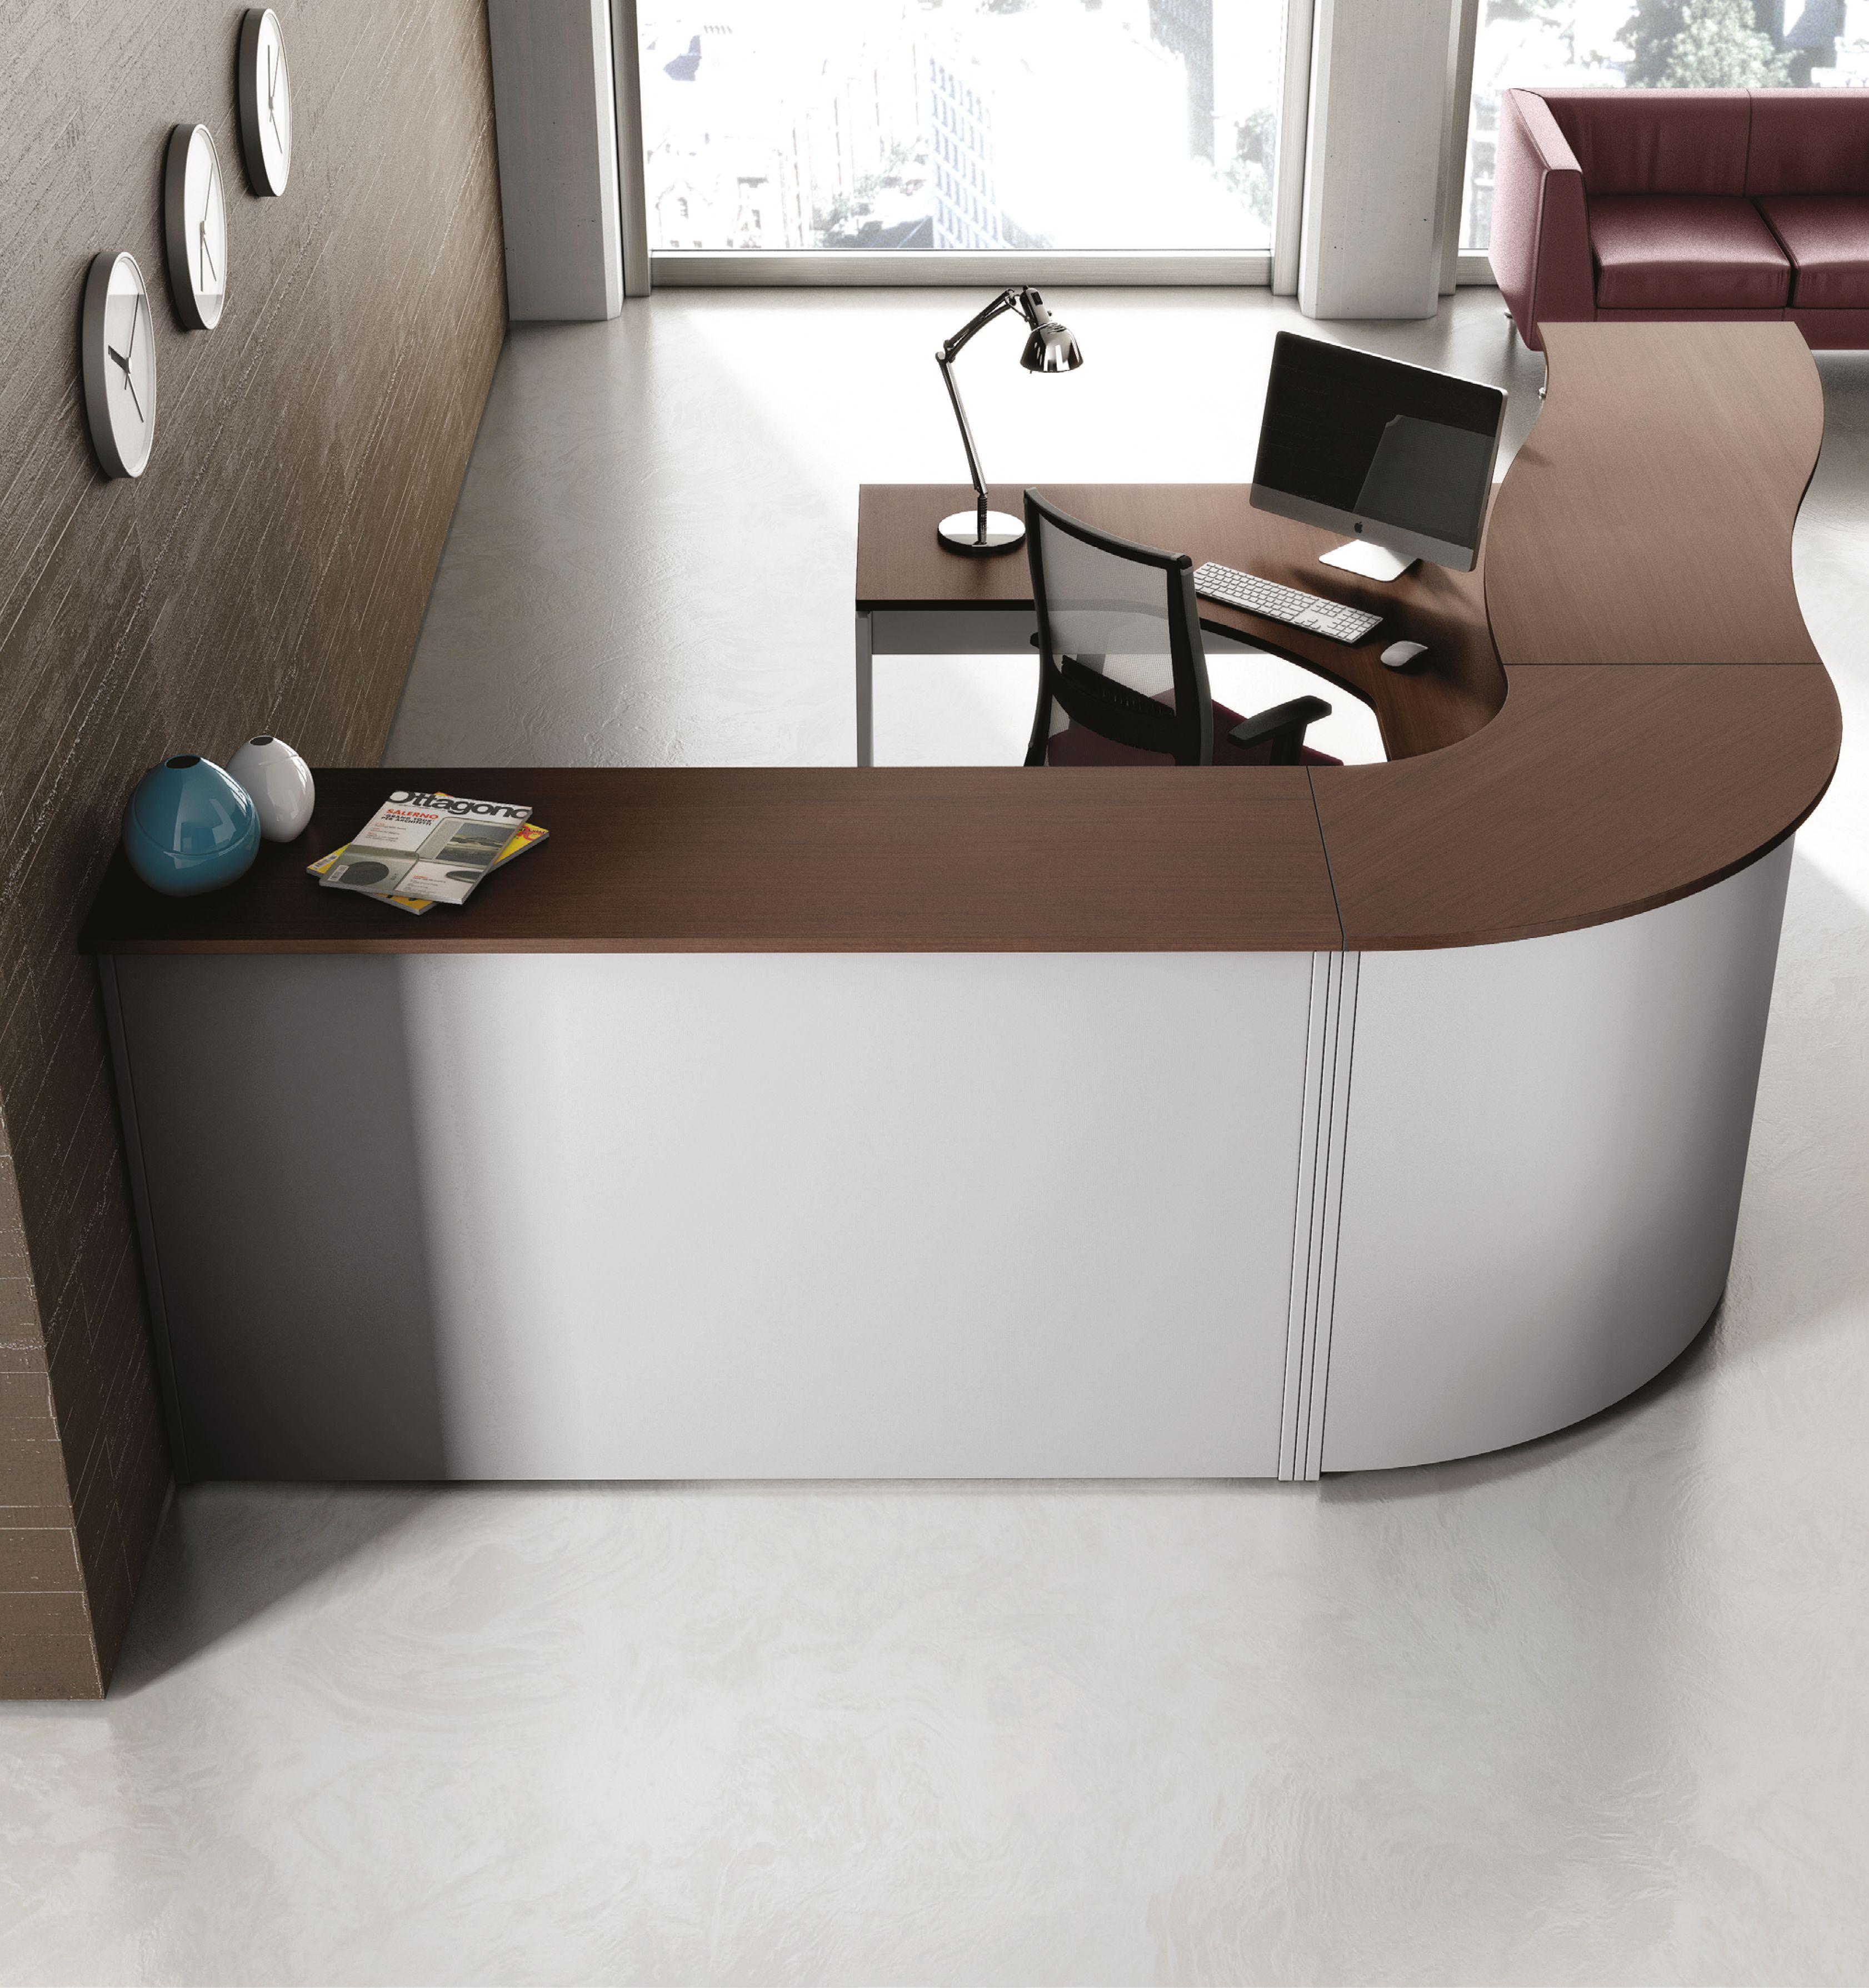 Mobili ufficio catania latest mobili catania concetto di mauro mobili catania with mobili - Ikea catania catalogo ...